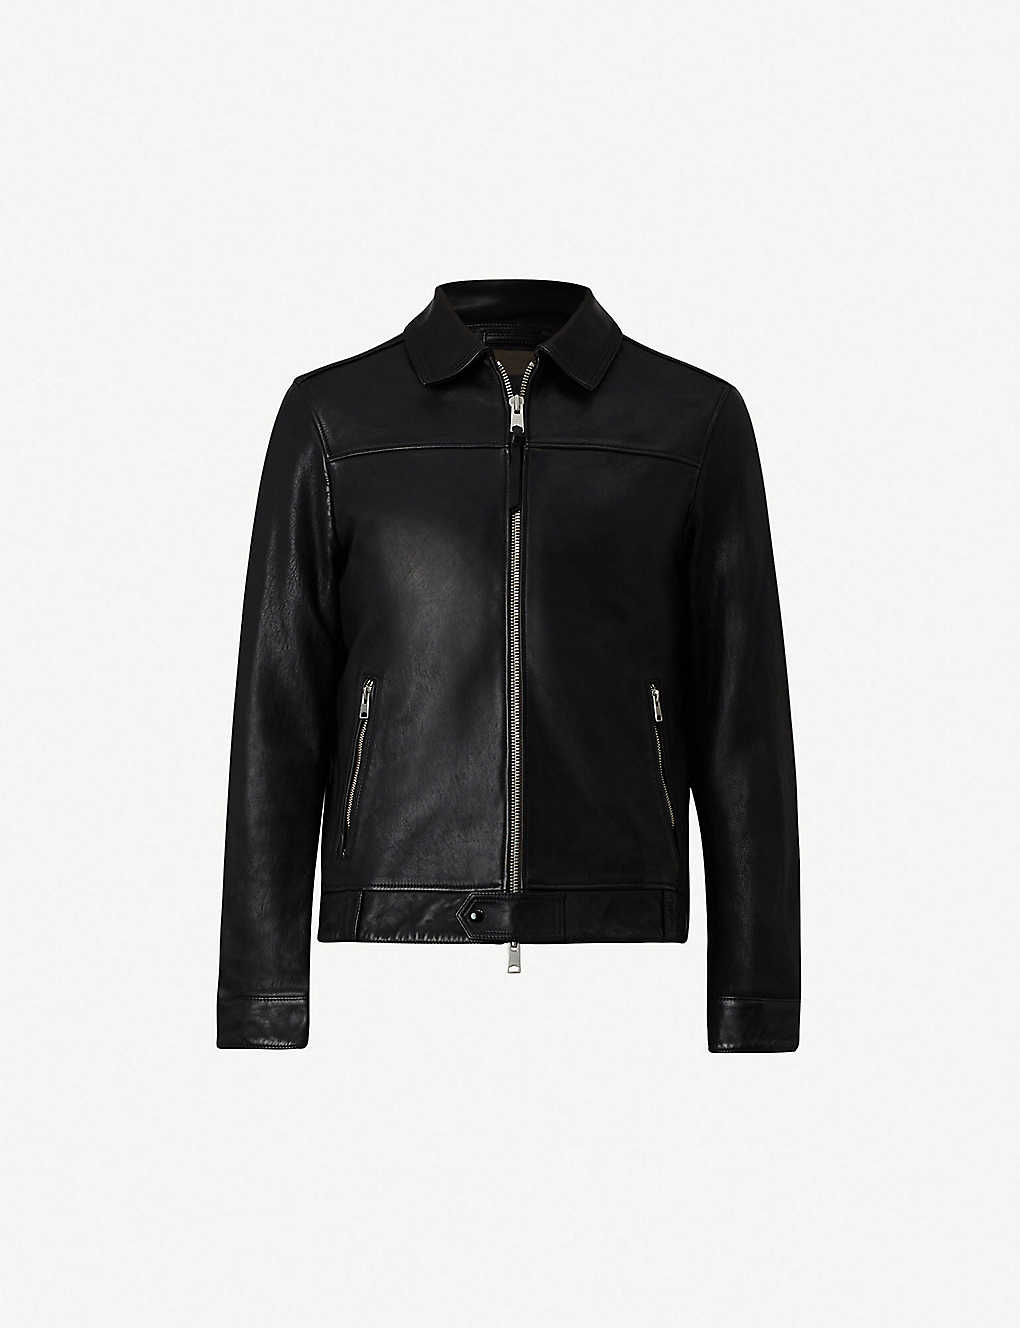 a036adf4c5ba Callon leather jacket zoom  Callon leather jacket zoom ...